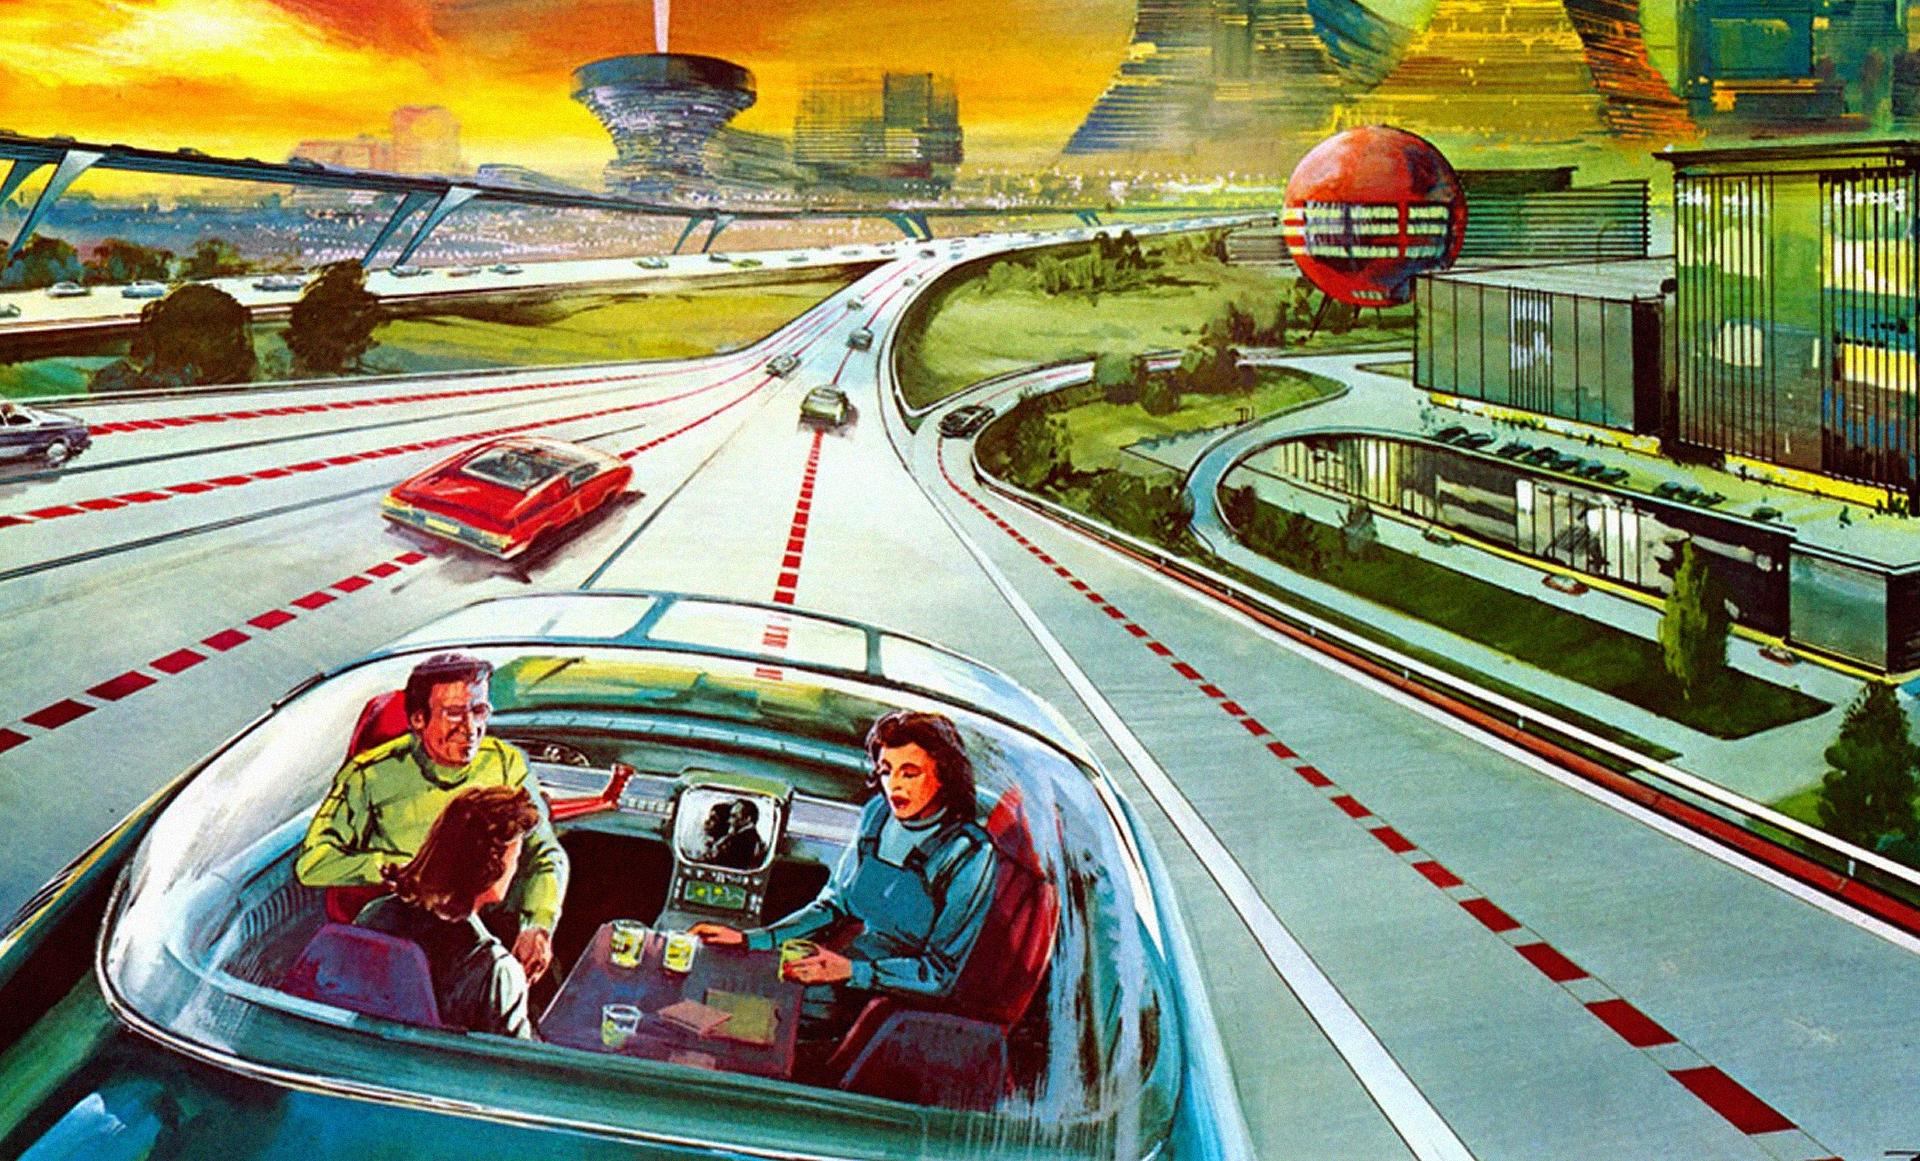 Кино, автопилот и батарейки: какими будут автомобили через 10-20 лет?. Фото 12